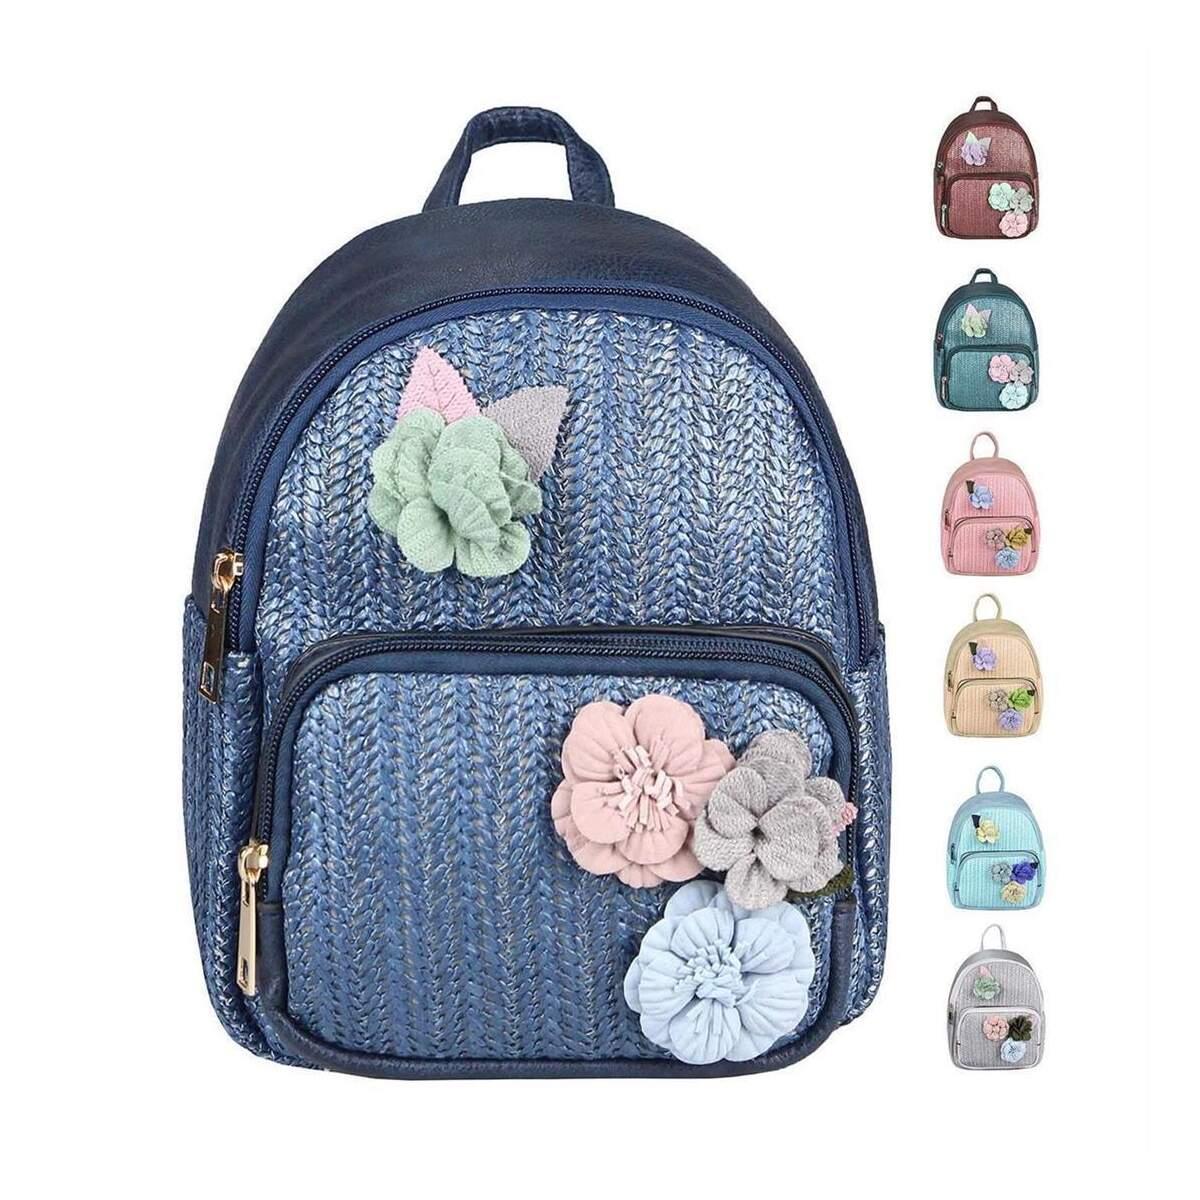 9c247597485925 ital-design DAMEN BLUMEN MINI-RUCKSACK Backpack Tasche Daypack Cityrucksack  Leder Optik Schultertasche Flechtoptik ...